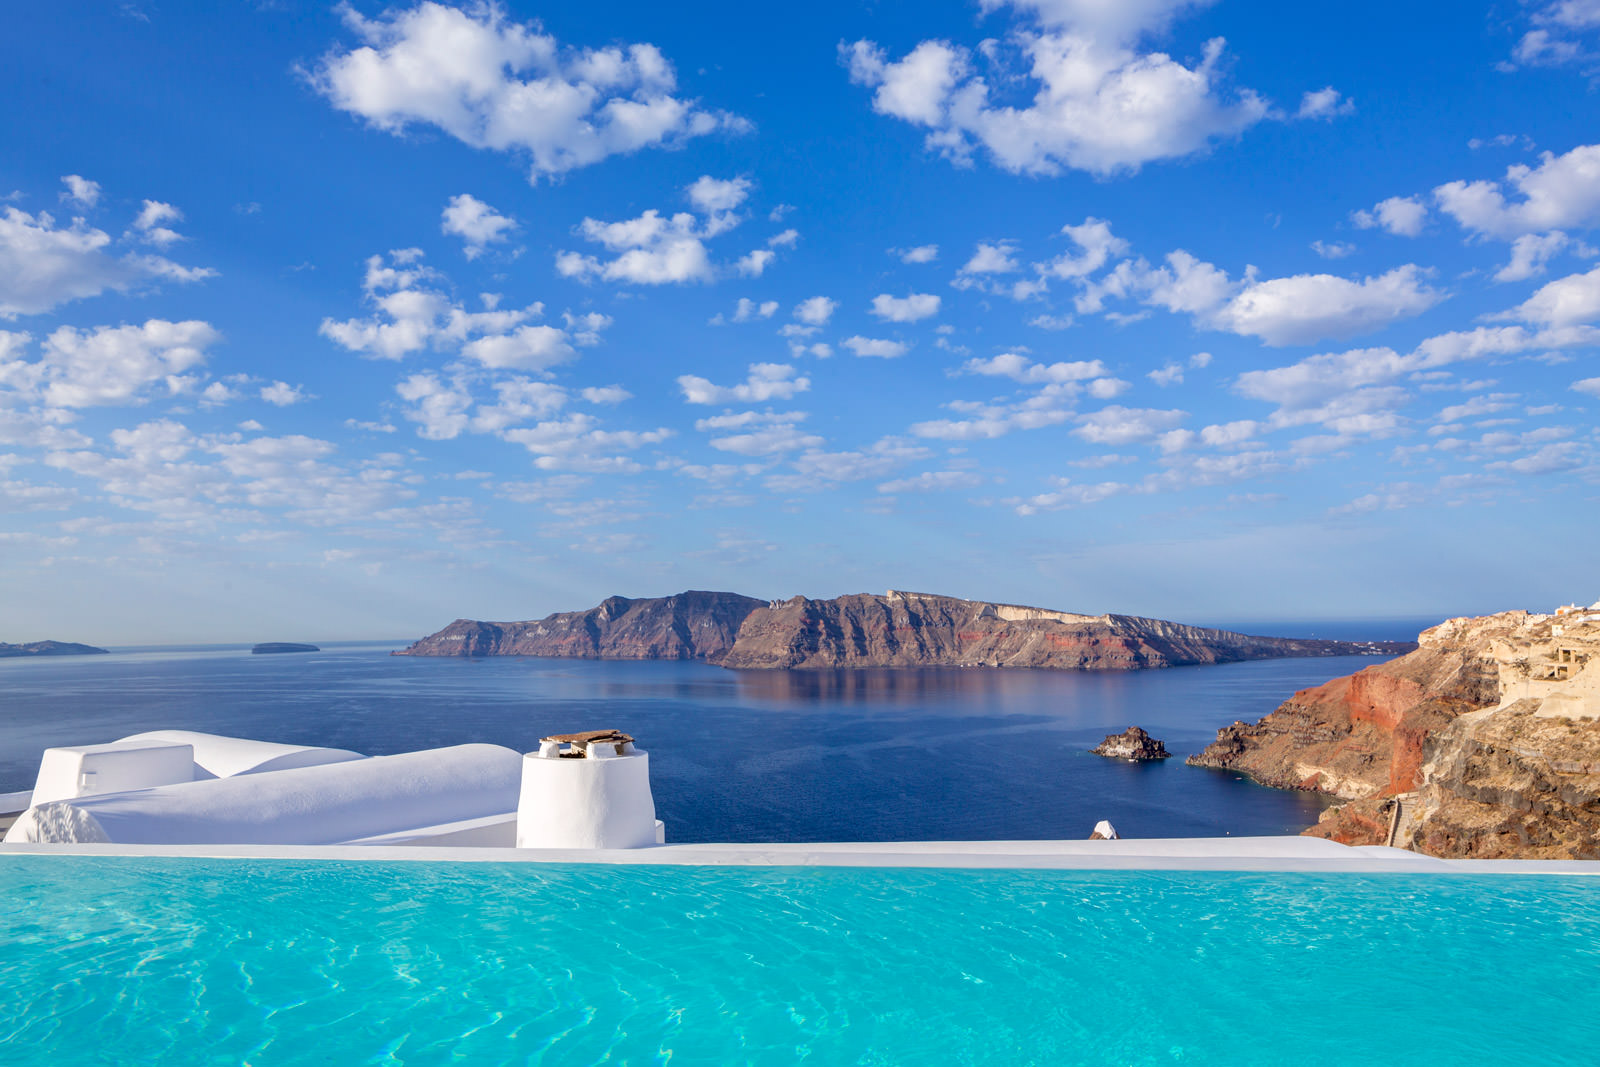 leukste eilanden griekenland santorini